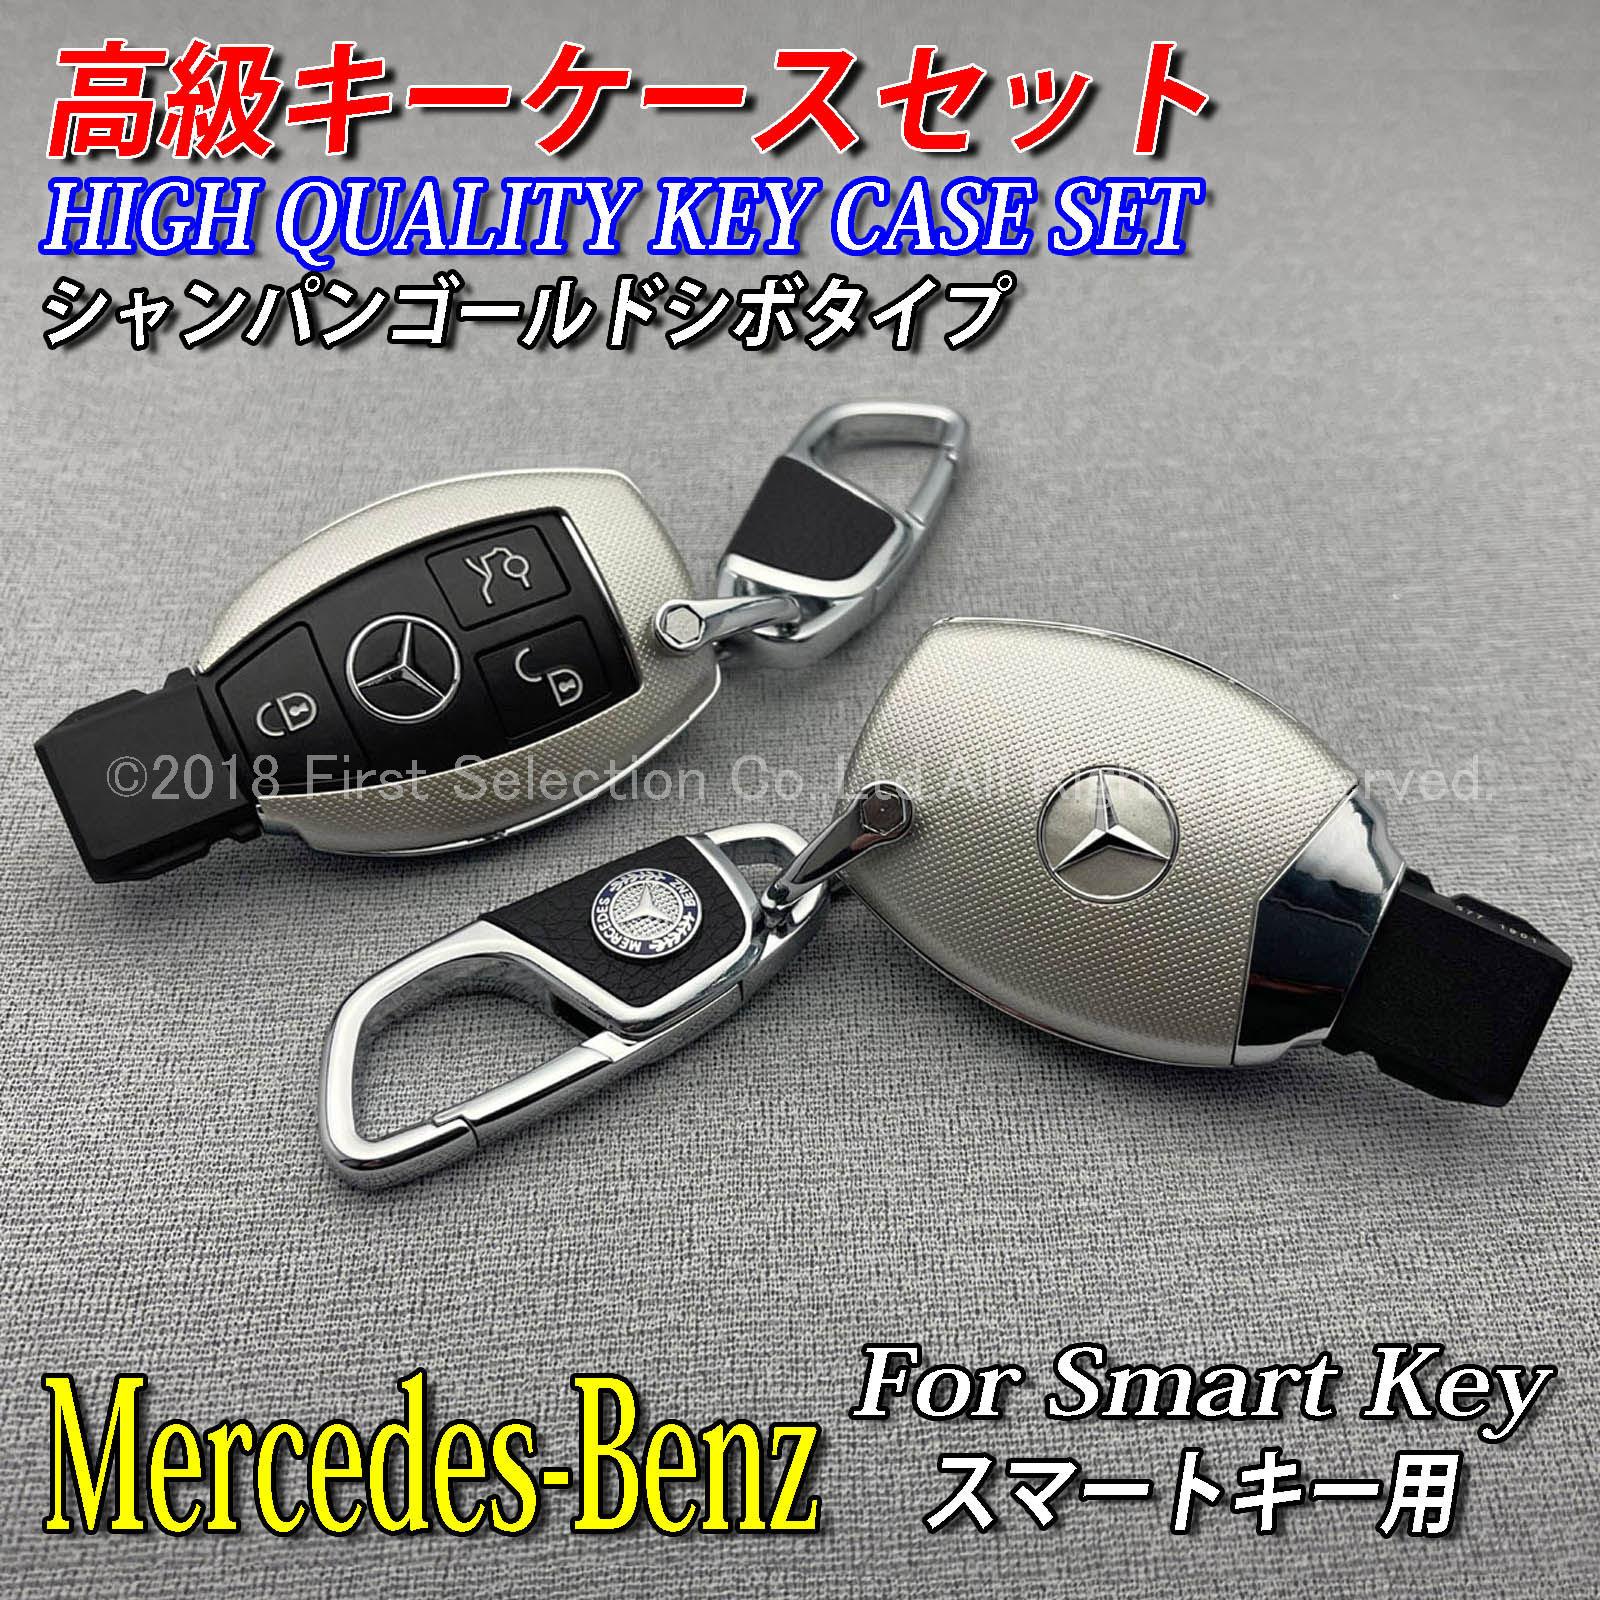 Mercedes-Benz ベンツ スマートキー用 高級キーケースセット C金シボ W176 W246 W205 W212 W222 W447 C117 C218 X156 X253 W166 X166